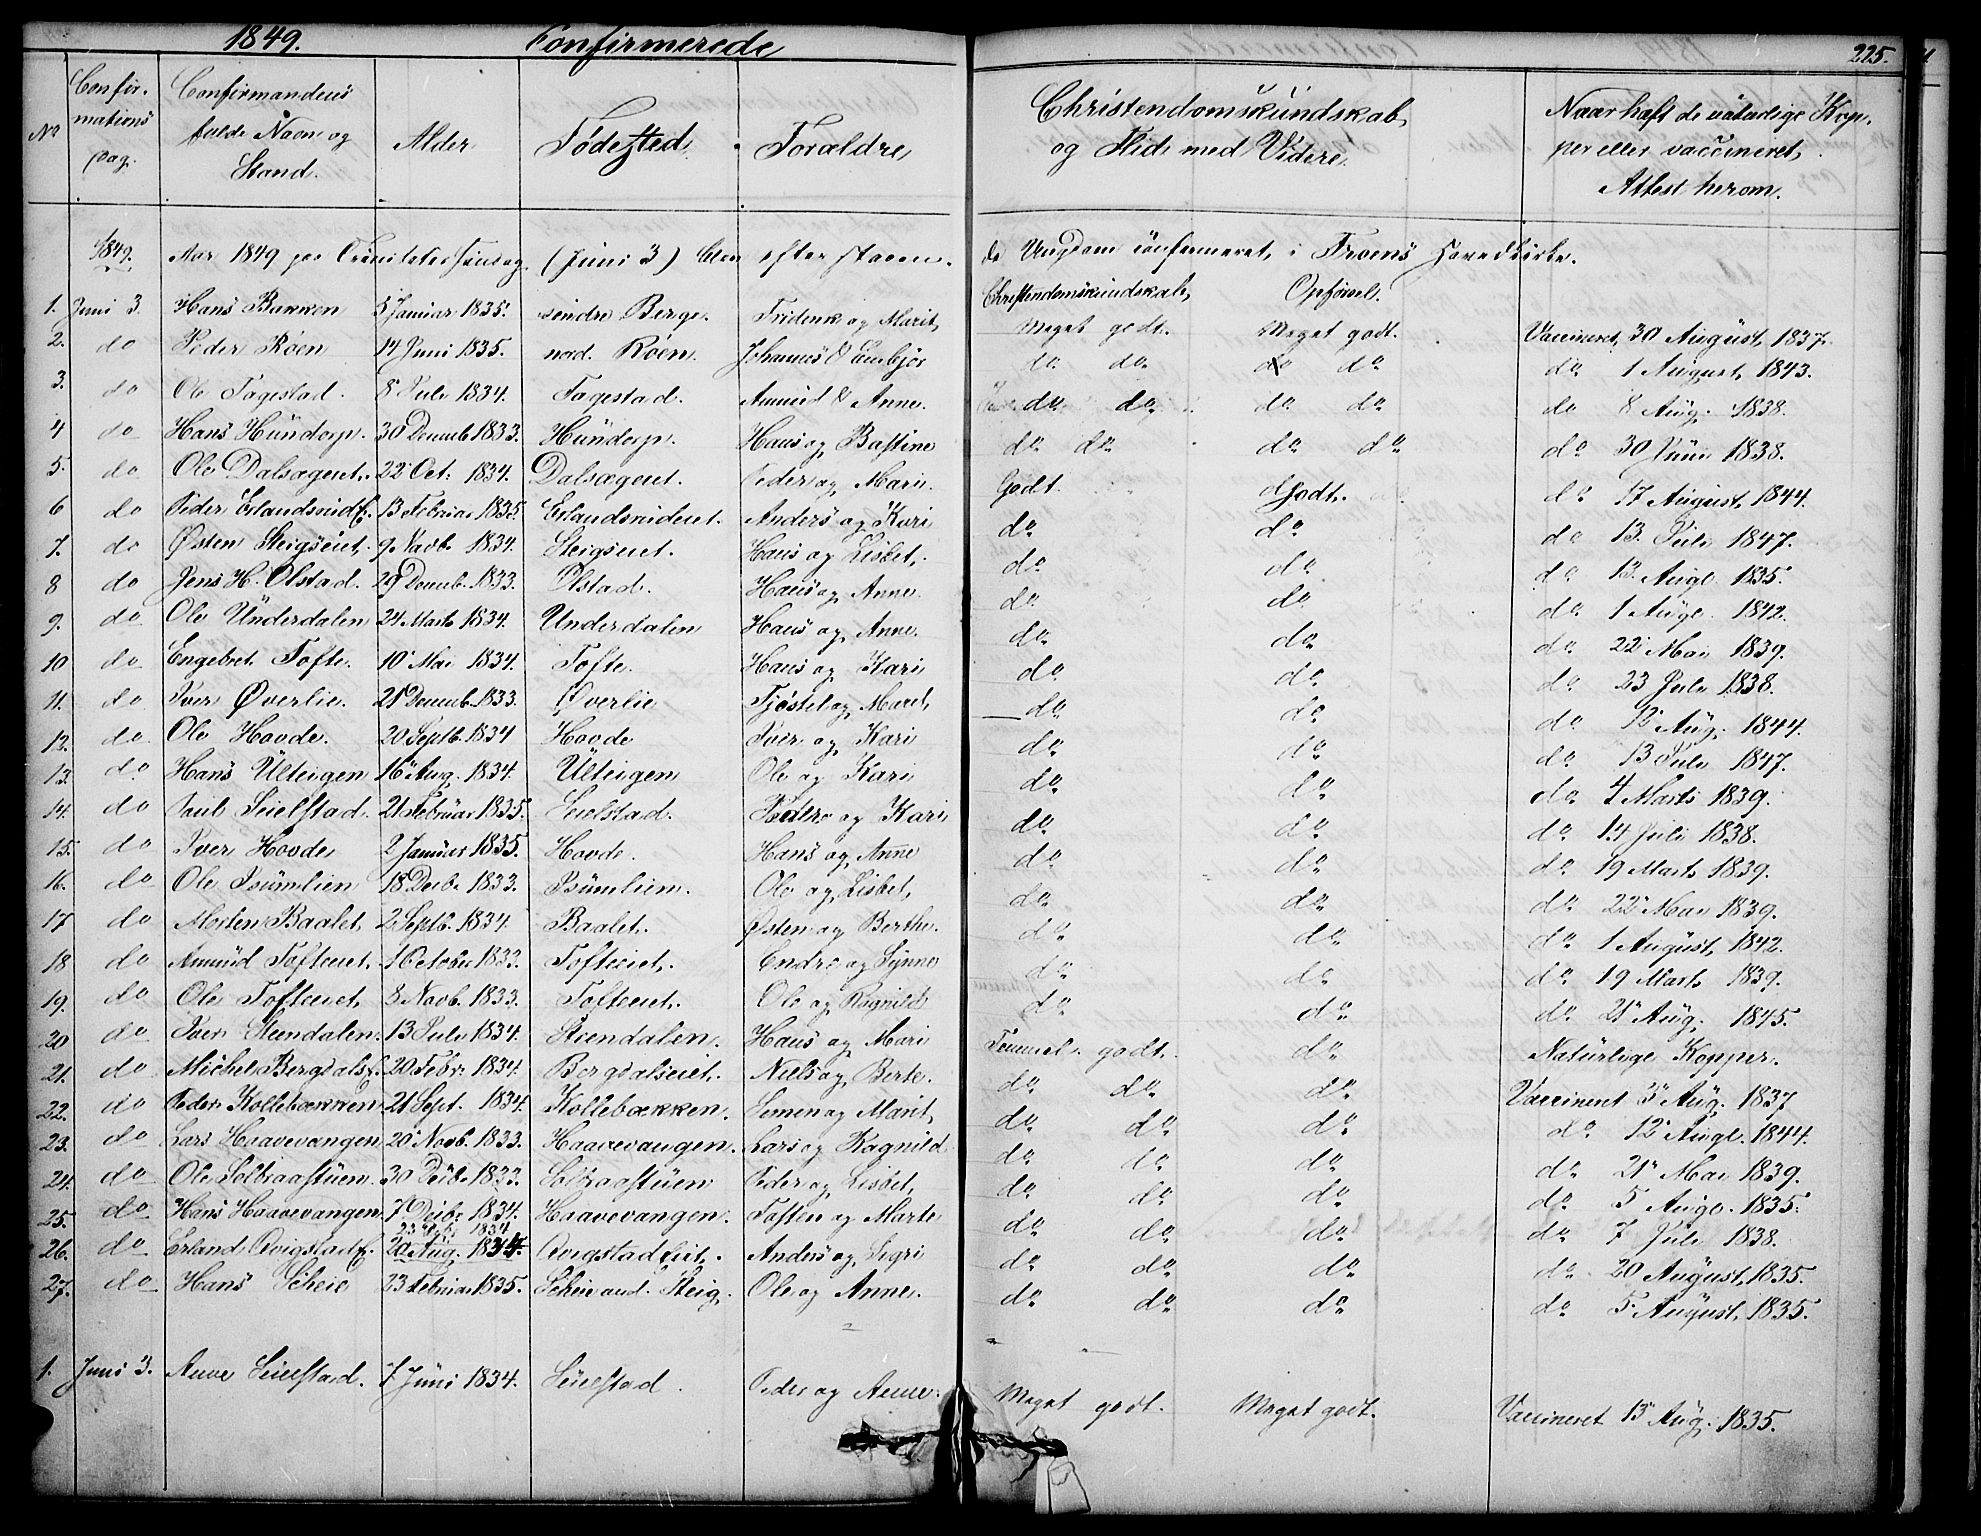 SAH, Sør-Fron prestekontor, H/Ha/Hab/L0001: Klokkerbok nr. 1, 1844-1863, s. 225